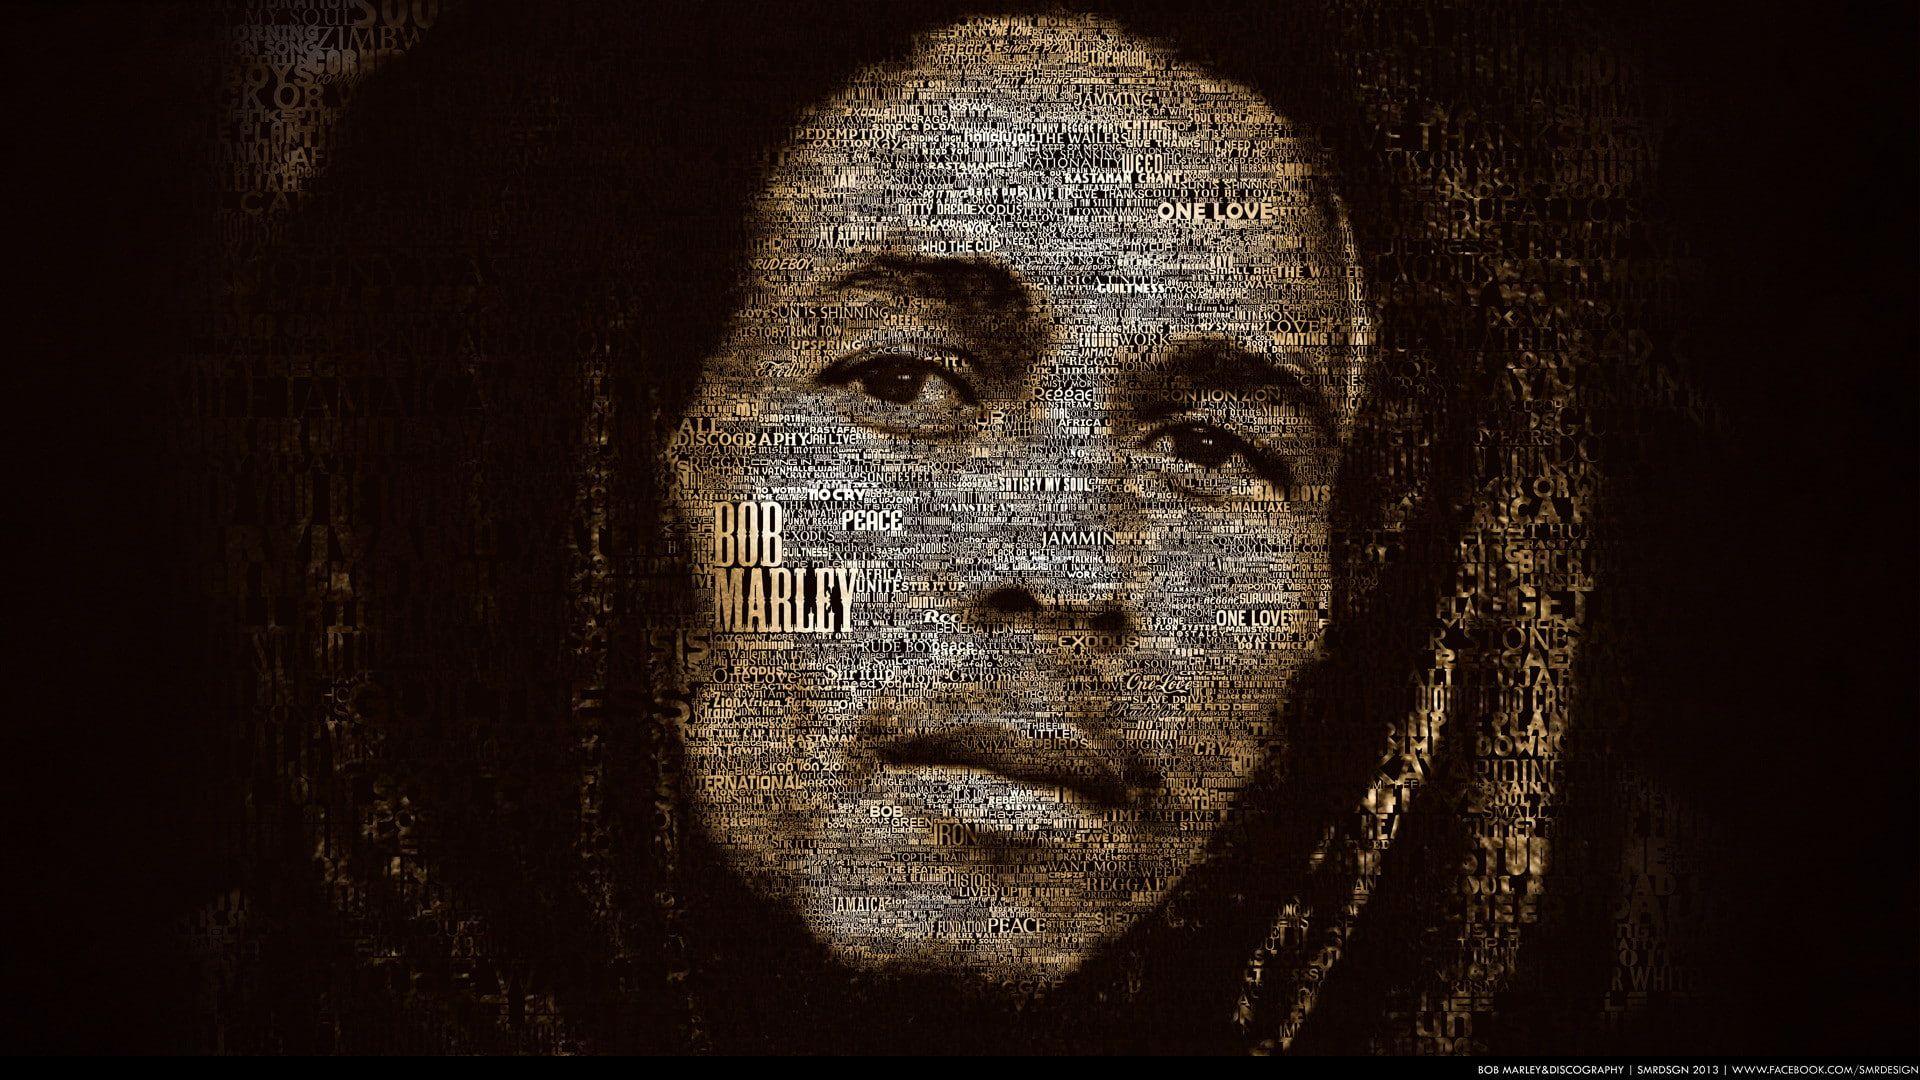 Typography 1920x1080 Bob Marley Hd 4k Bob Marley Discography 1080p Wallpaper Hdwallpaper Desktop Bob Marley Bob Marley Music Bob Marley Painting